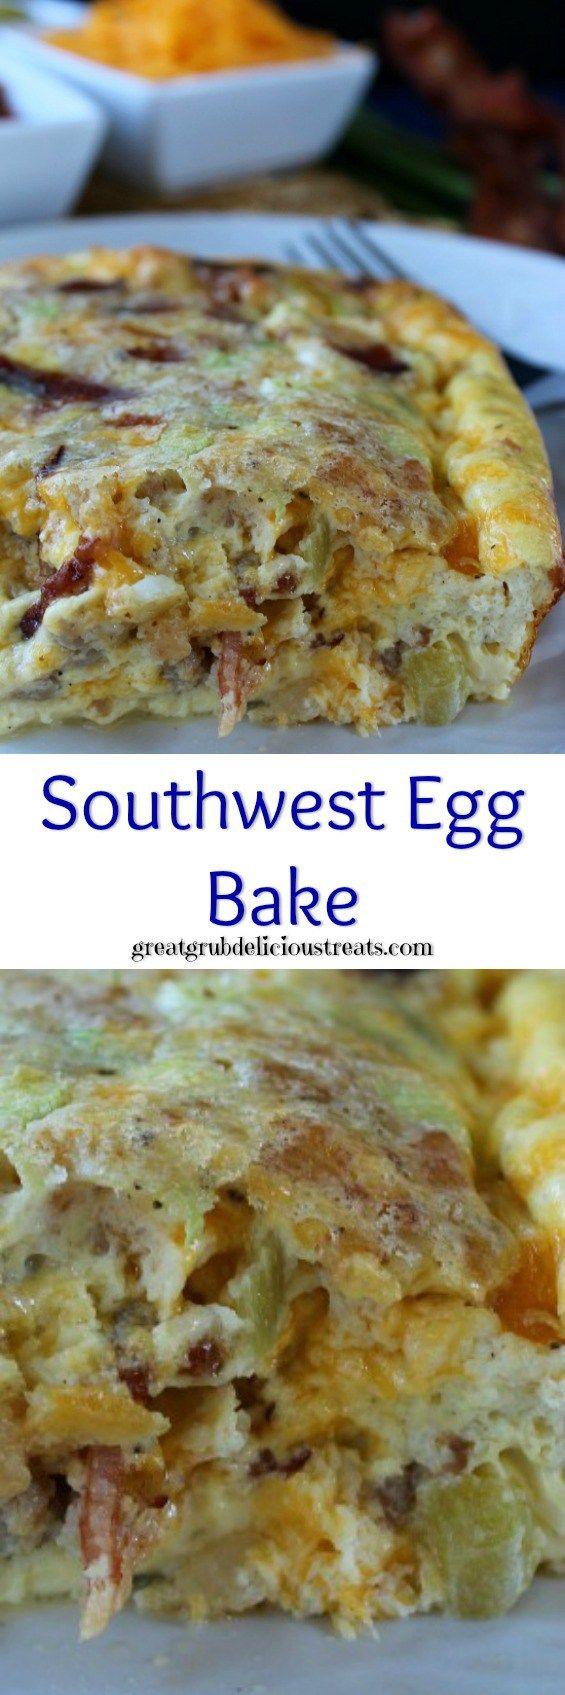 Southwest Egg Bake Eggs, sausage & bacon